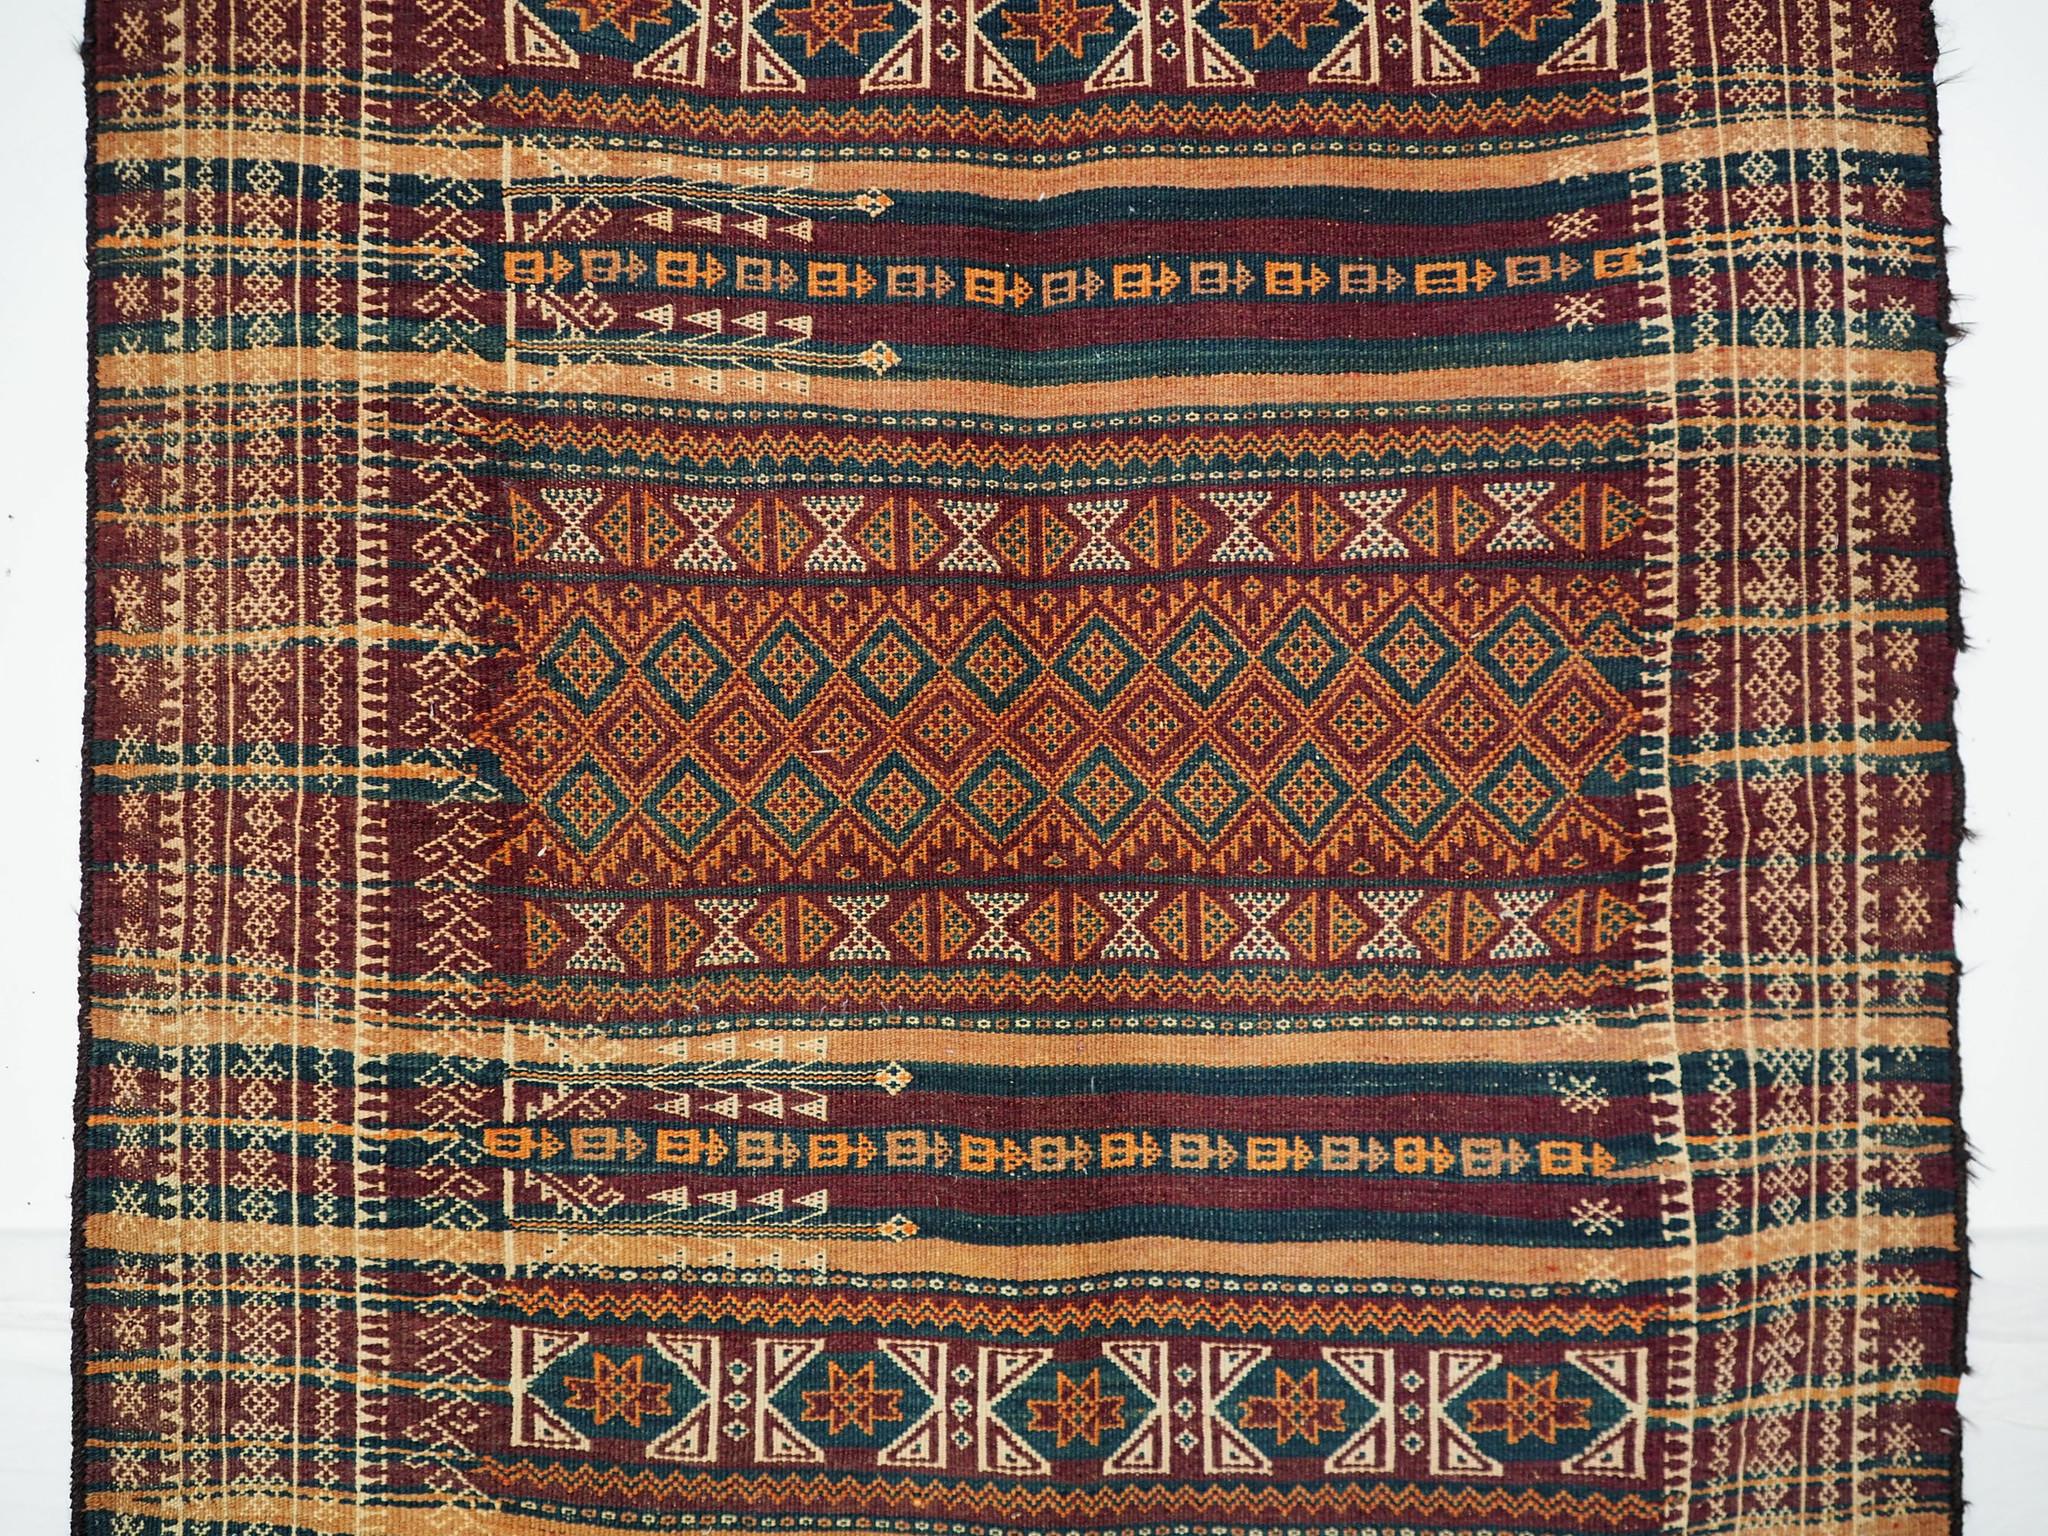 300x116 cm Antik Balouch  kelim afghan Beloch kilim Nr-19/PK-10